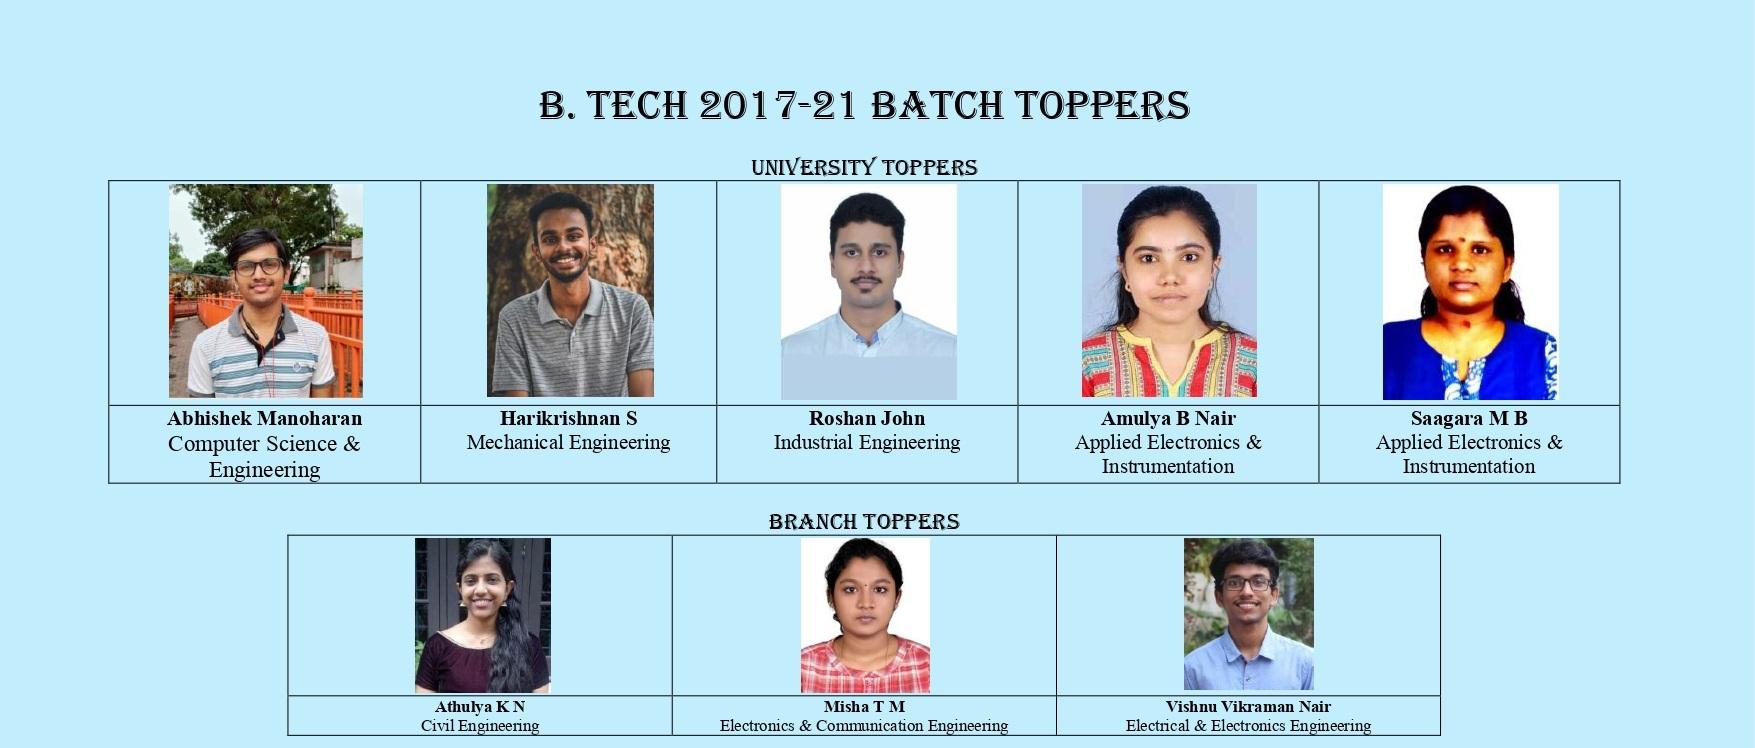 B.Tech 2017-2021 Batch Toppers